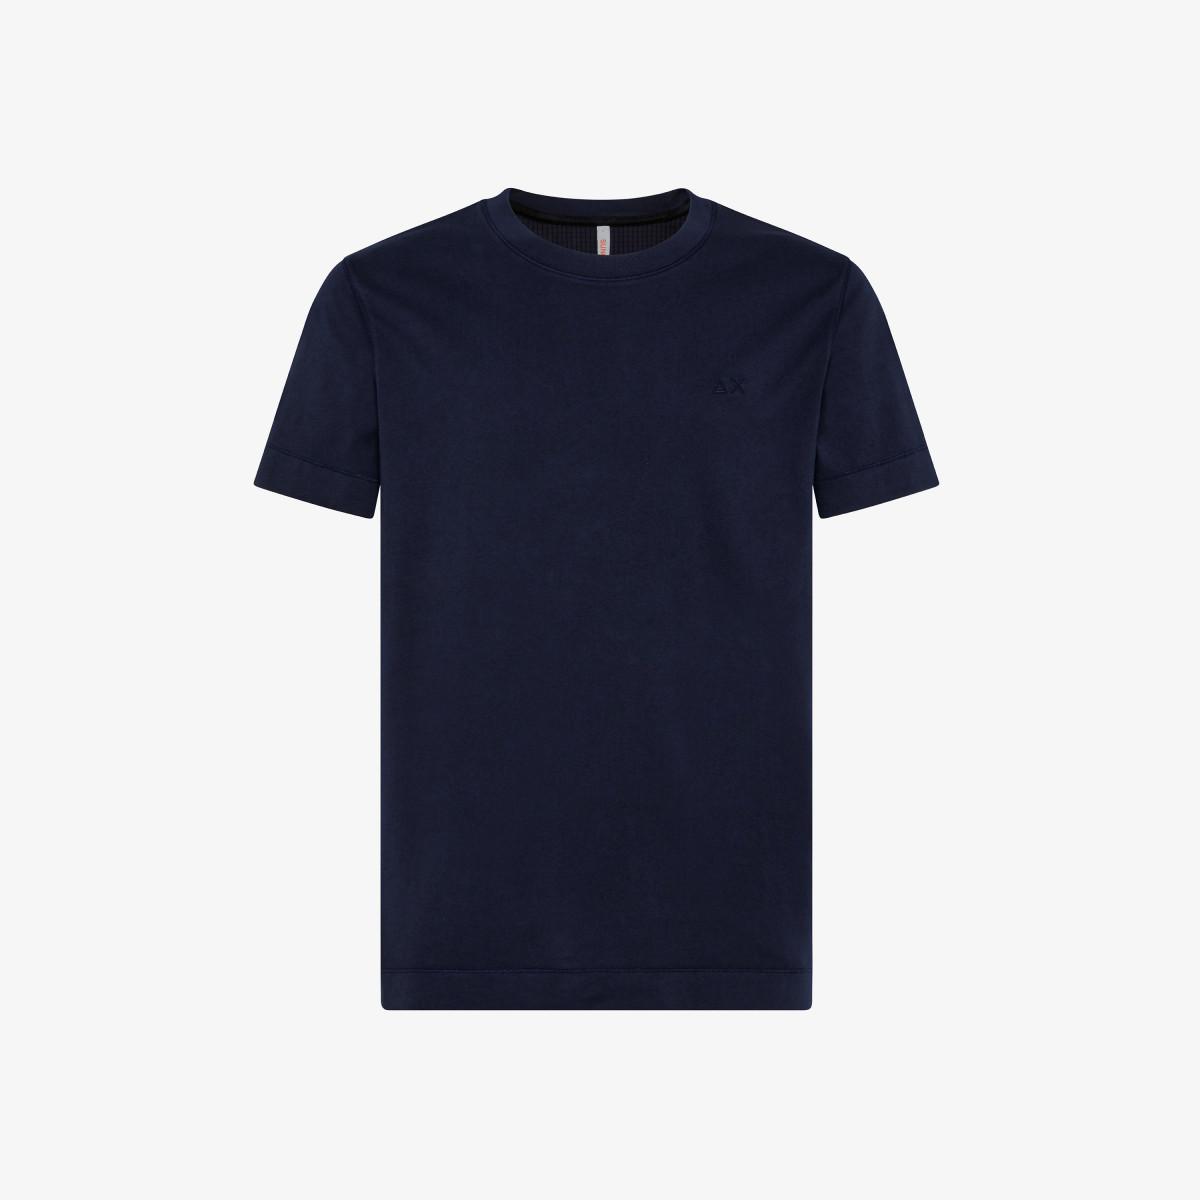 T-SHIRT COLD DYE S/S NAVY BLUE